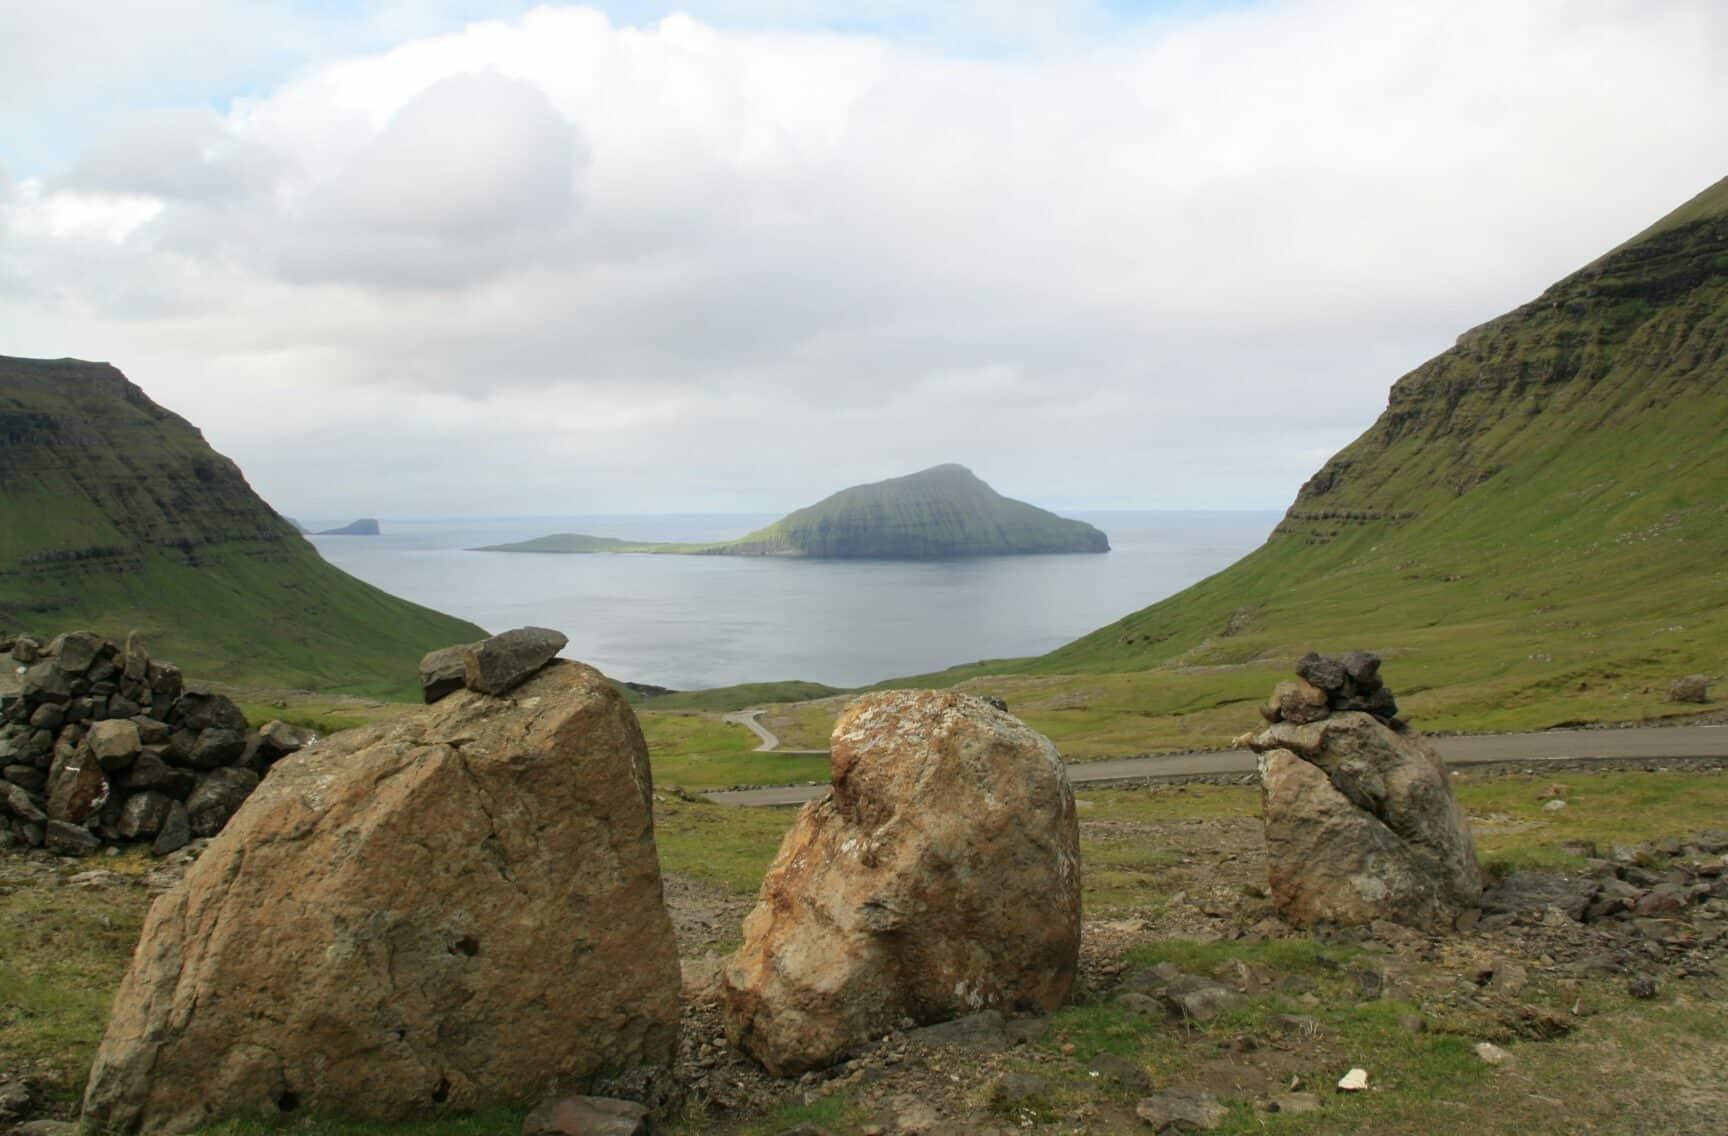 Faerské-ostrovy-DK-1-scaled-e1598995543502